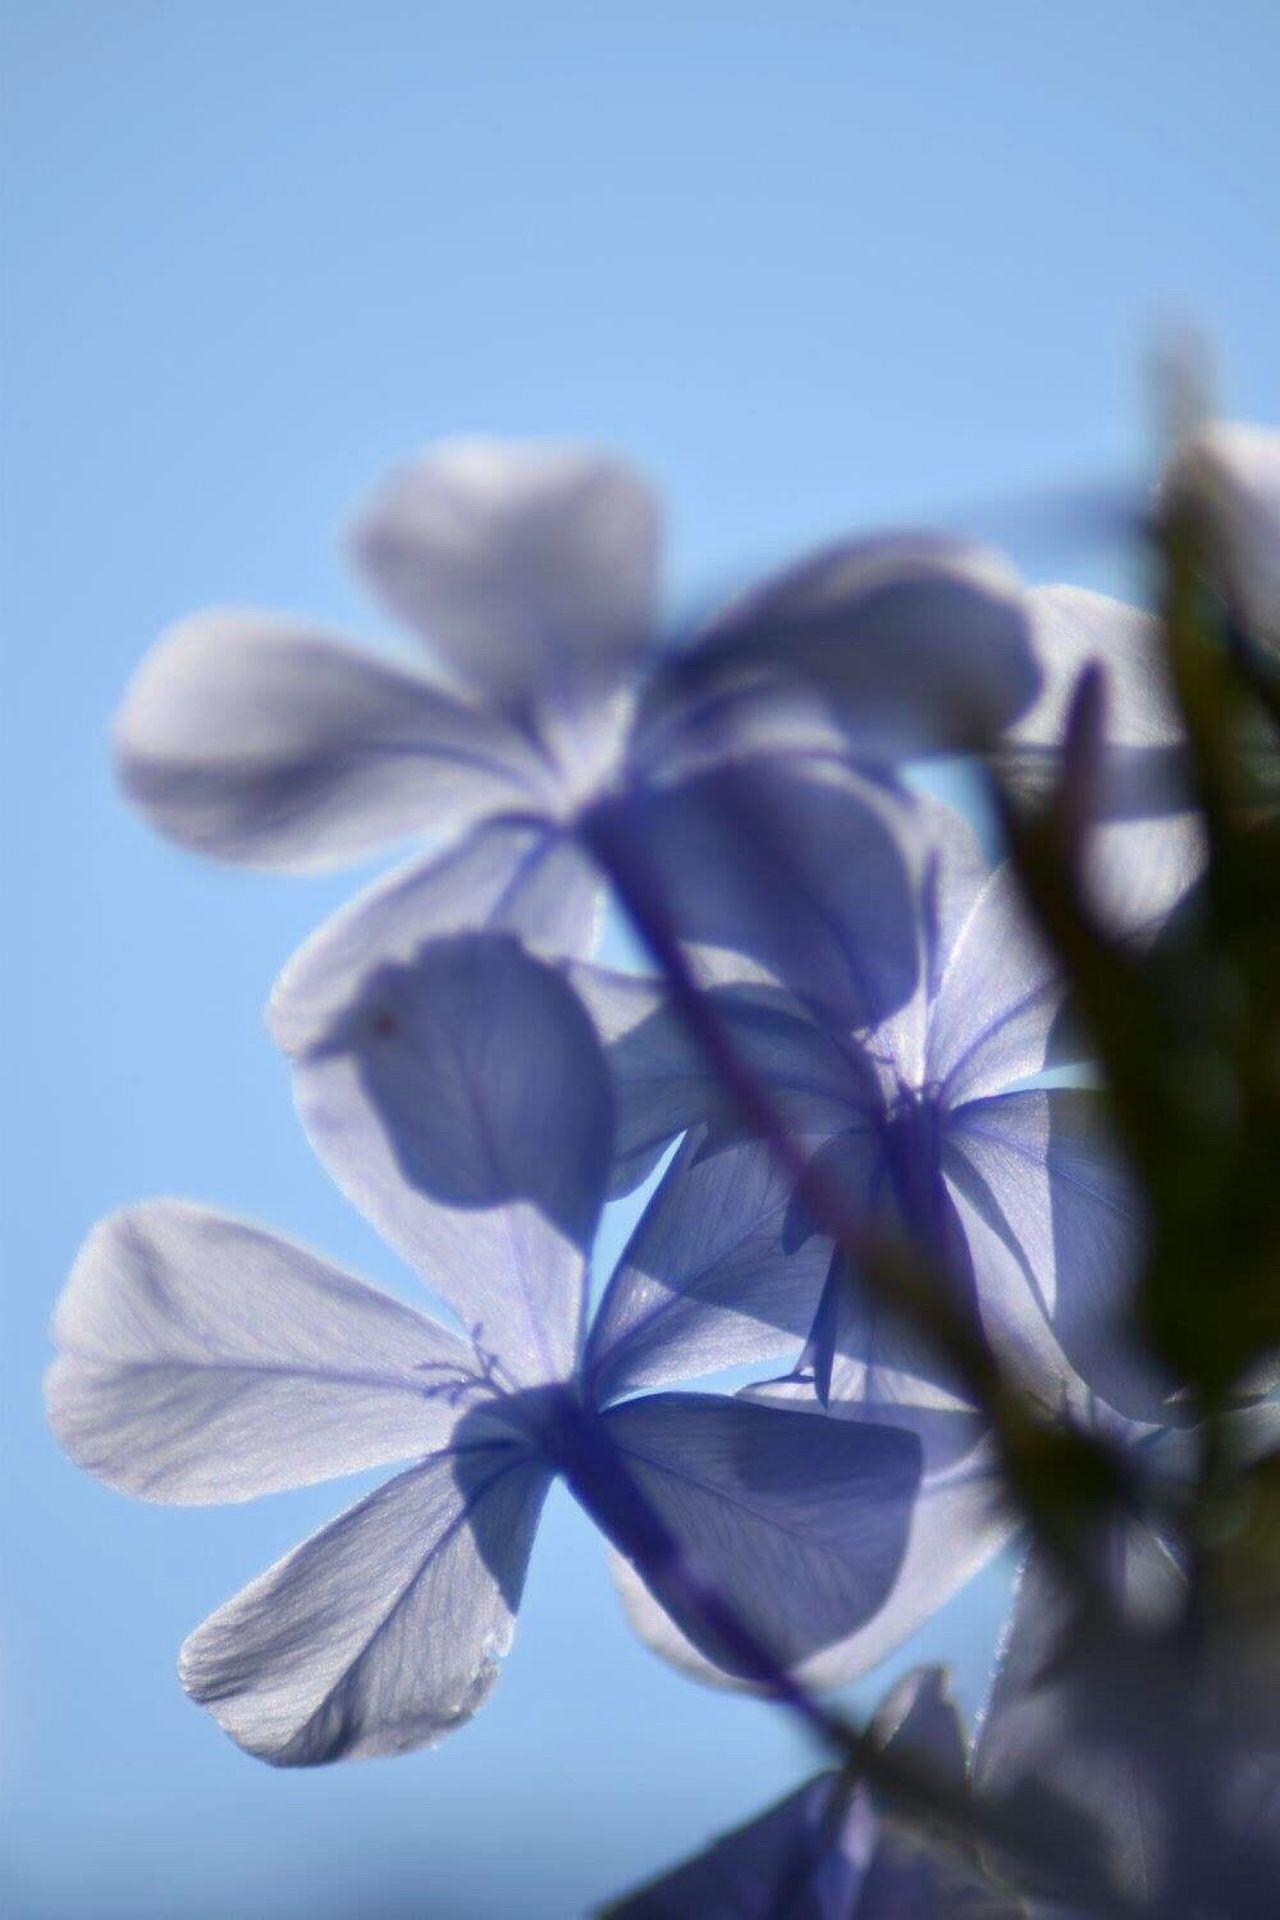 Beautifully Organized Blue Flowers